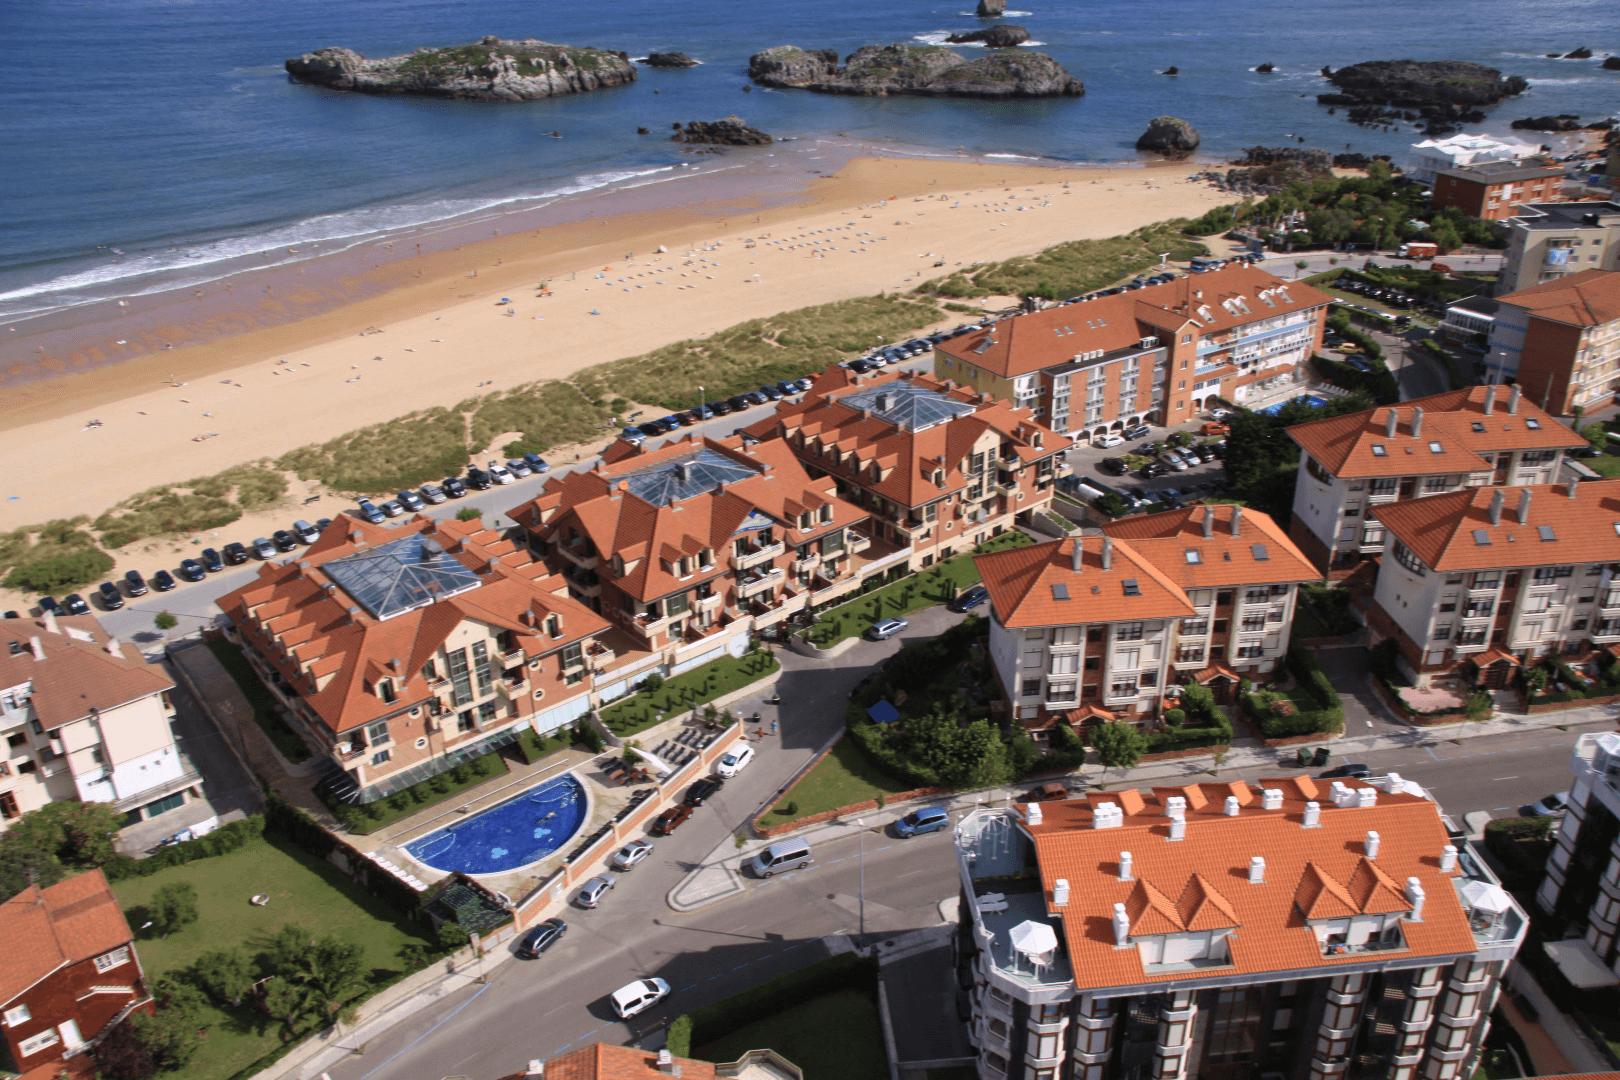 hoteles de playa Vista área Hotel Marítimo Ris en Noja, Cantabria